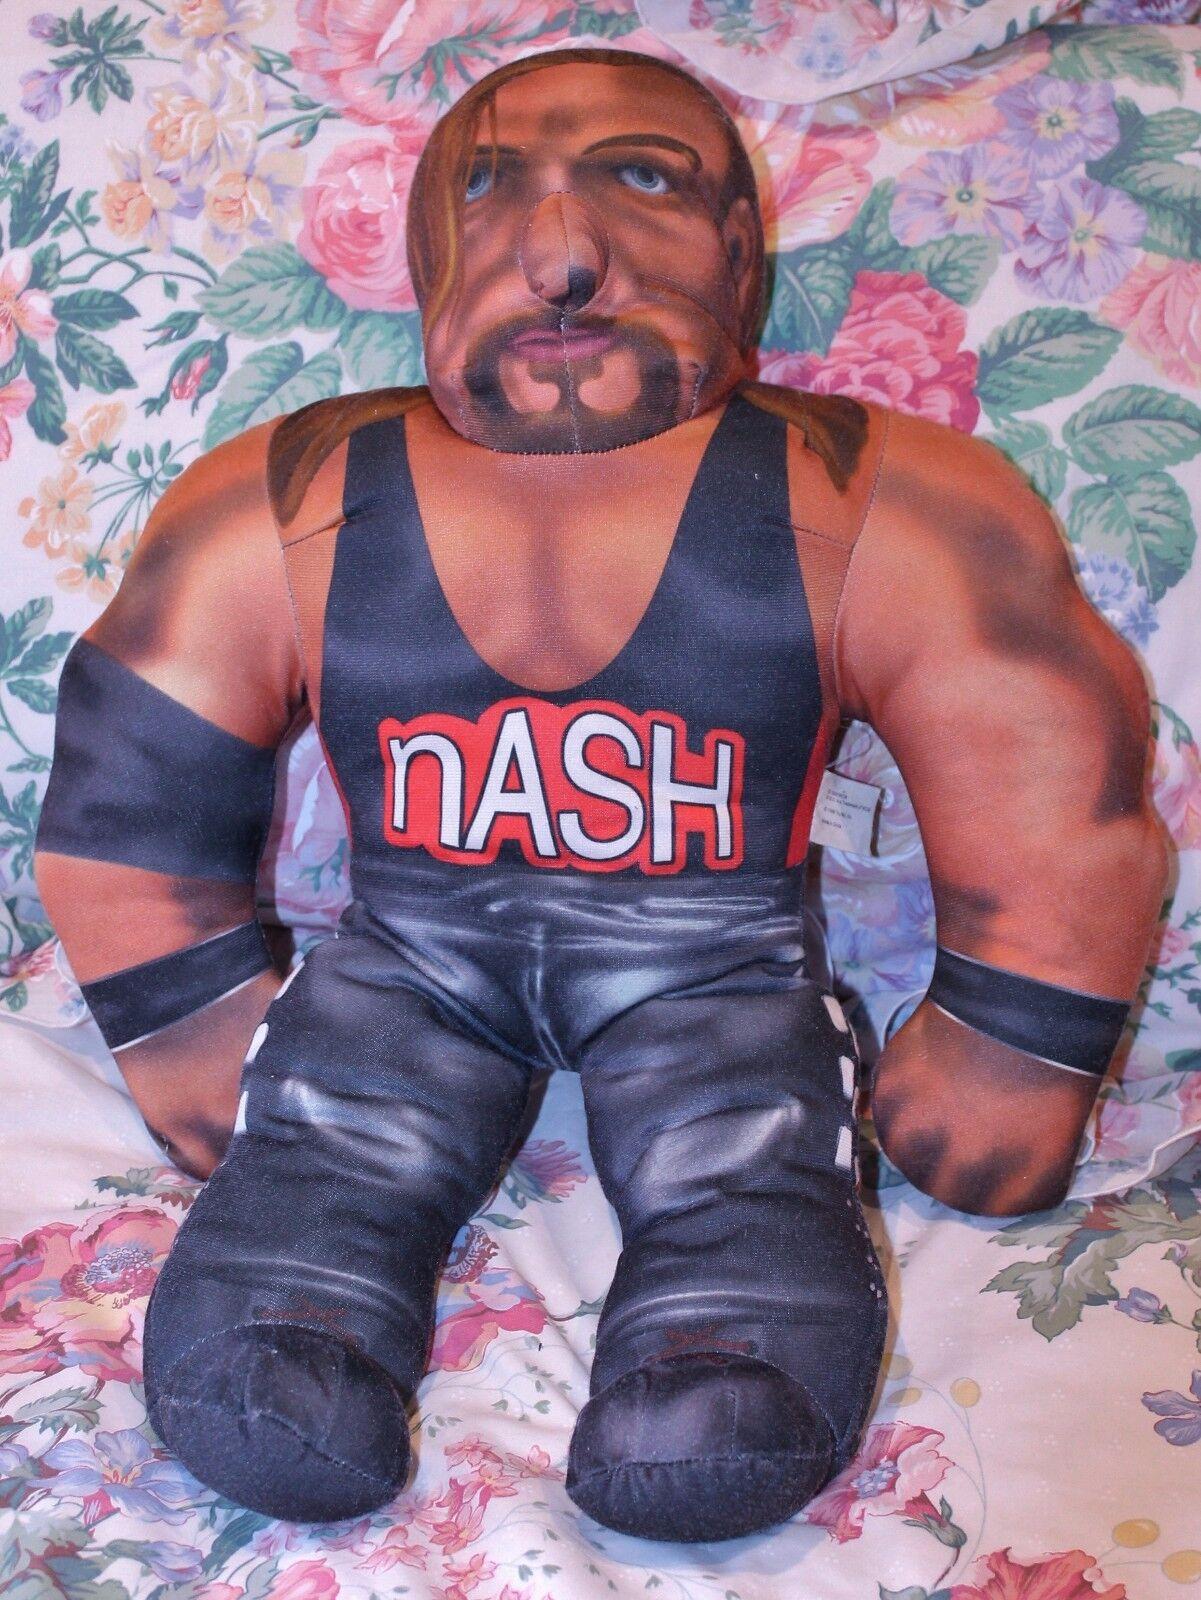 TOY BIZ WCW WRESTLING NWO BASHIN' BRAWLERS KEVIN NASH 21 INCH 1998 TALKING RARE